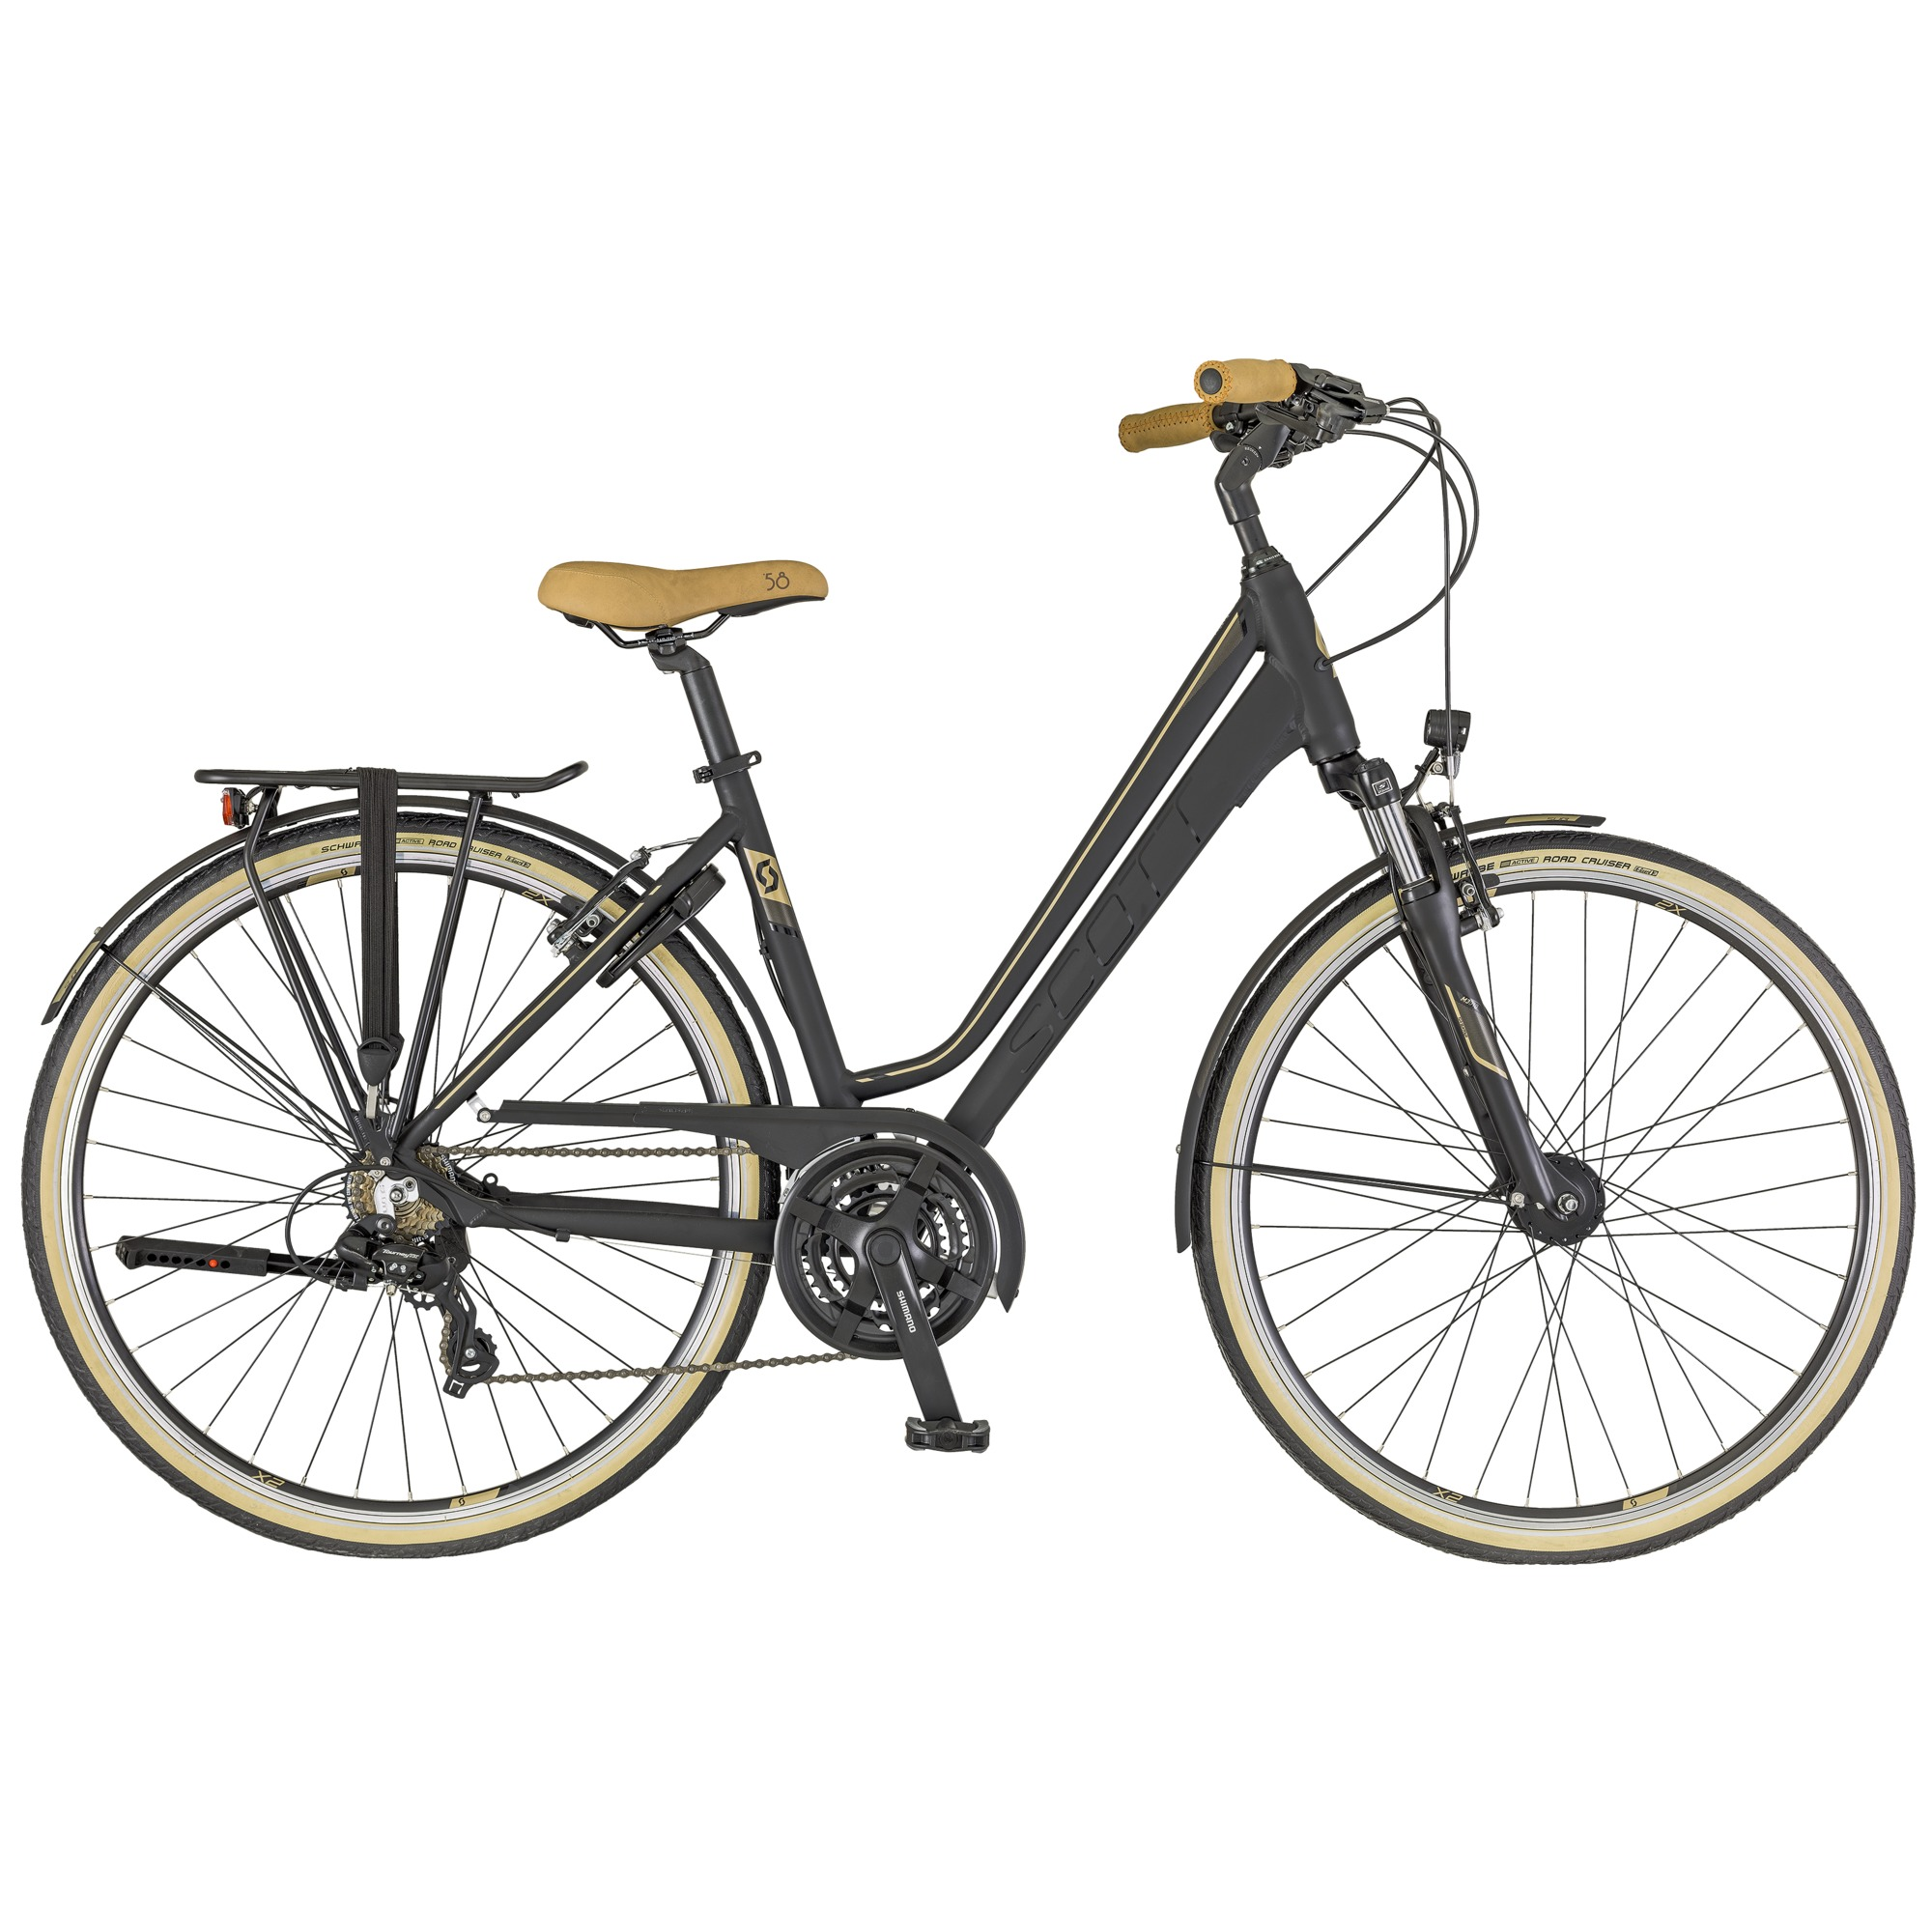 SCOTT Sub Comfort 20 Unisex Bike M - SCOTT Sub Comfort 20 Unisex Bike M